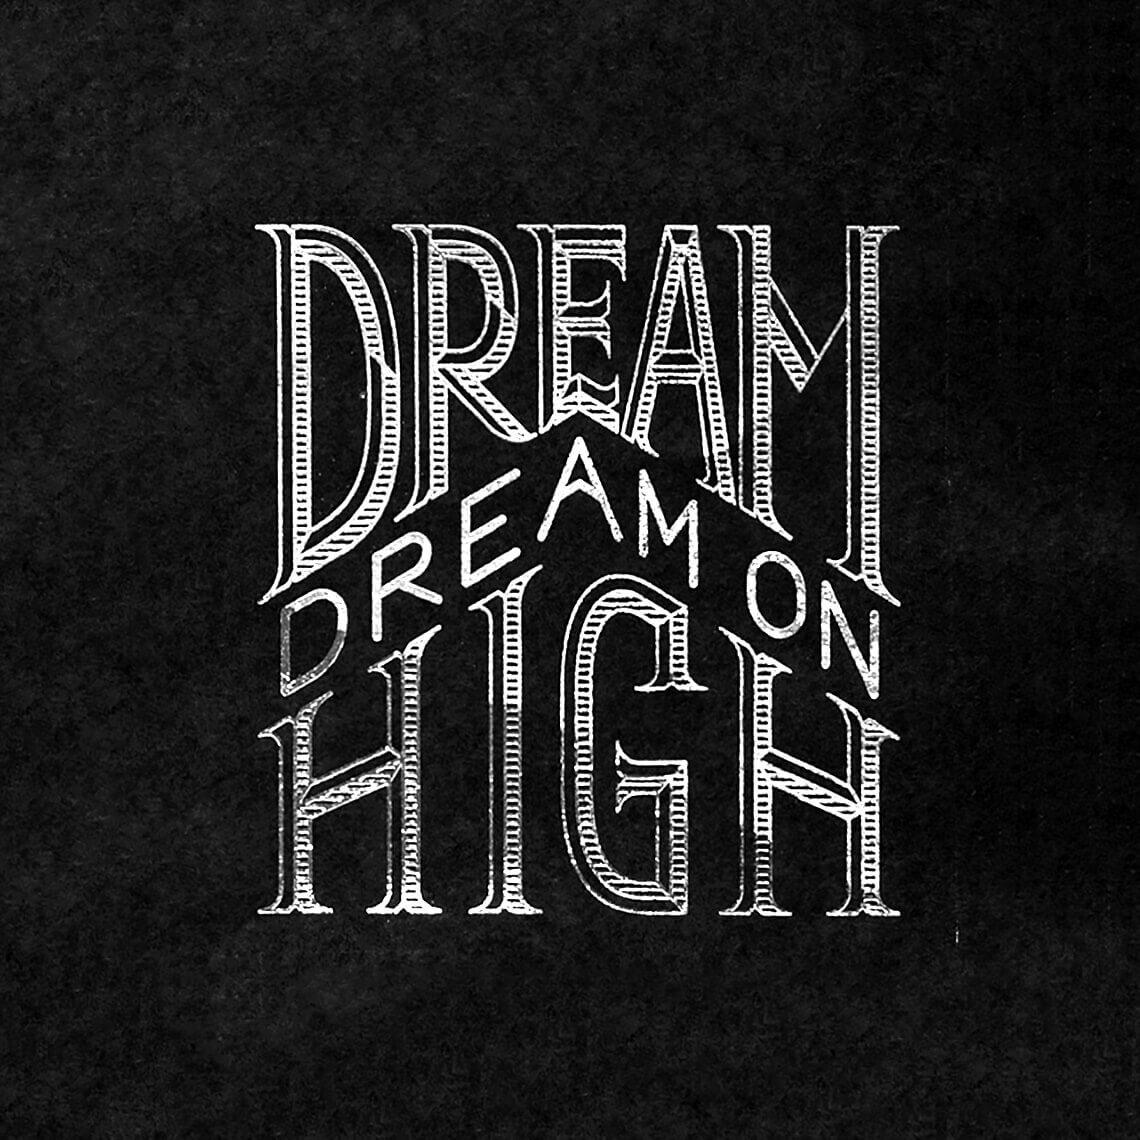 Type-DreamHigh-DreamOn